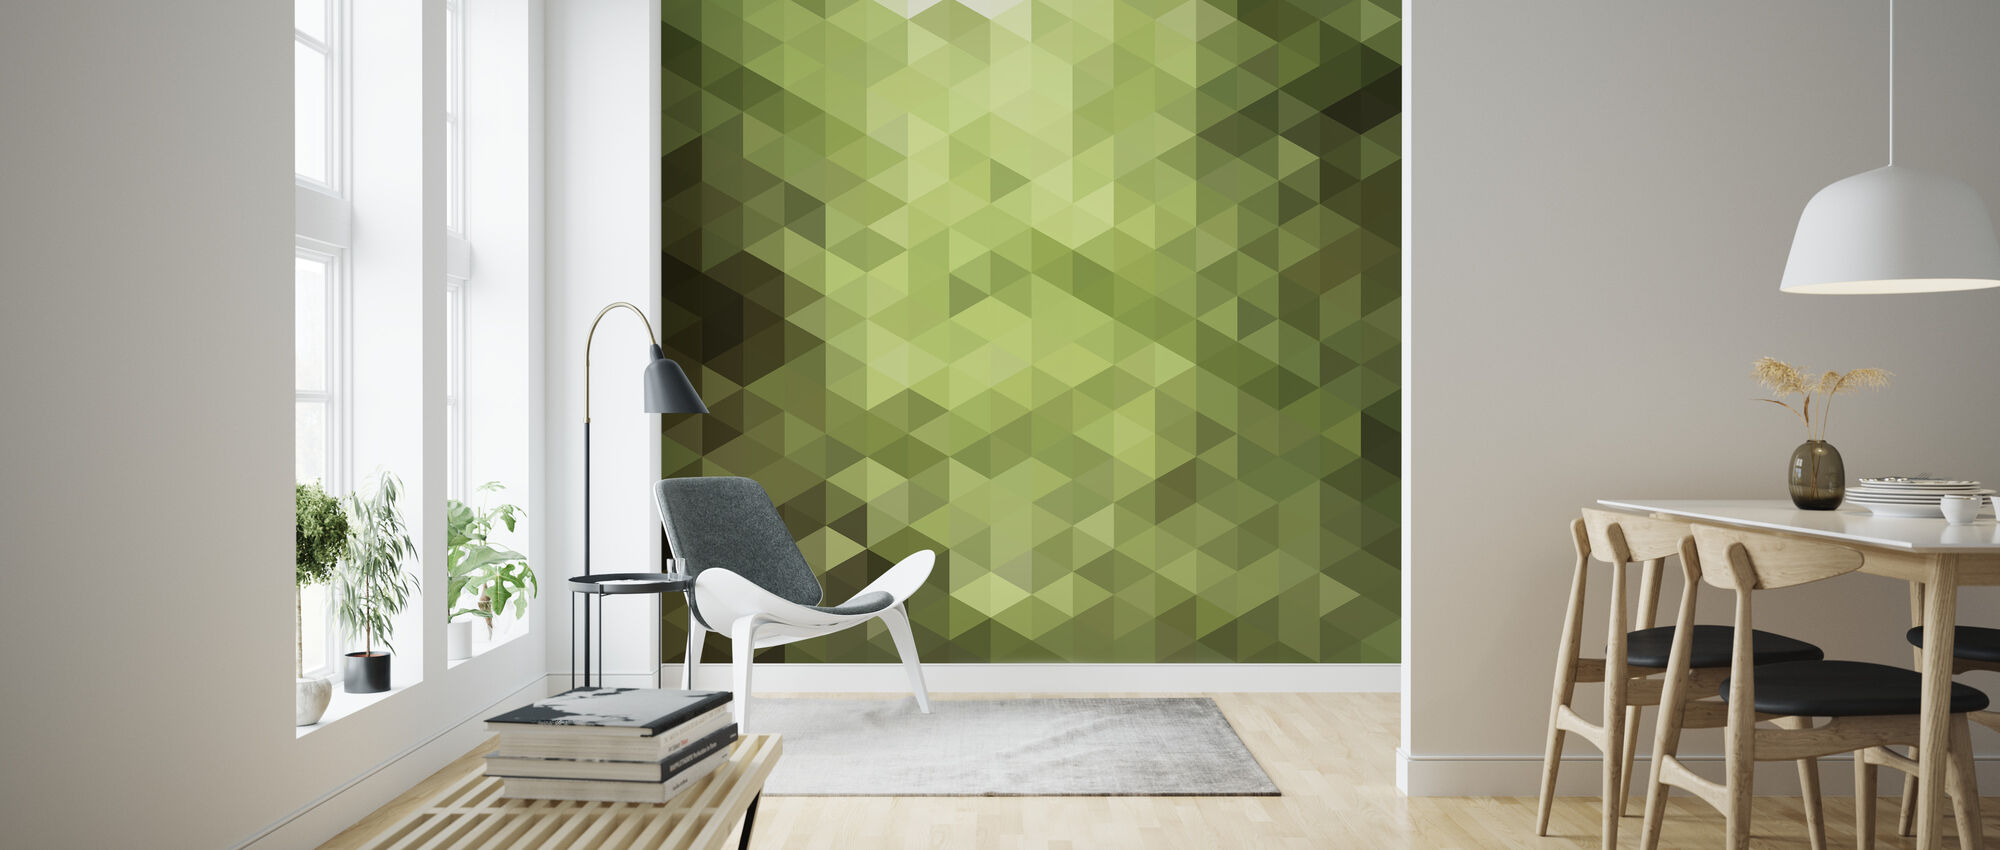 Triangle Polygons Art Pattern - Wallpaper - Living Room